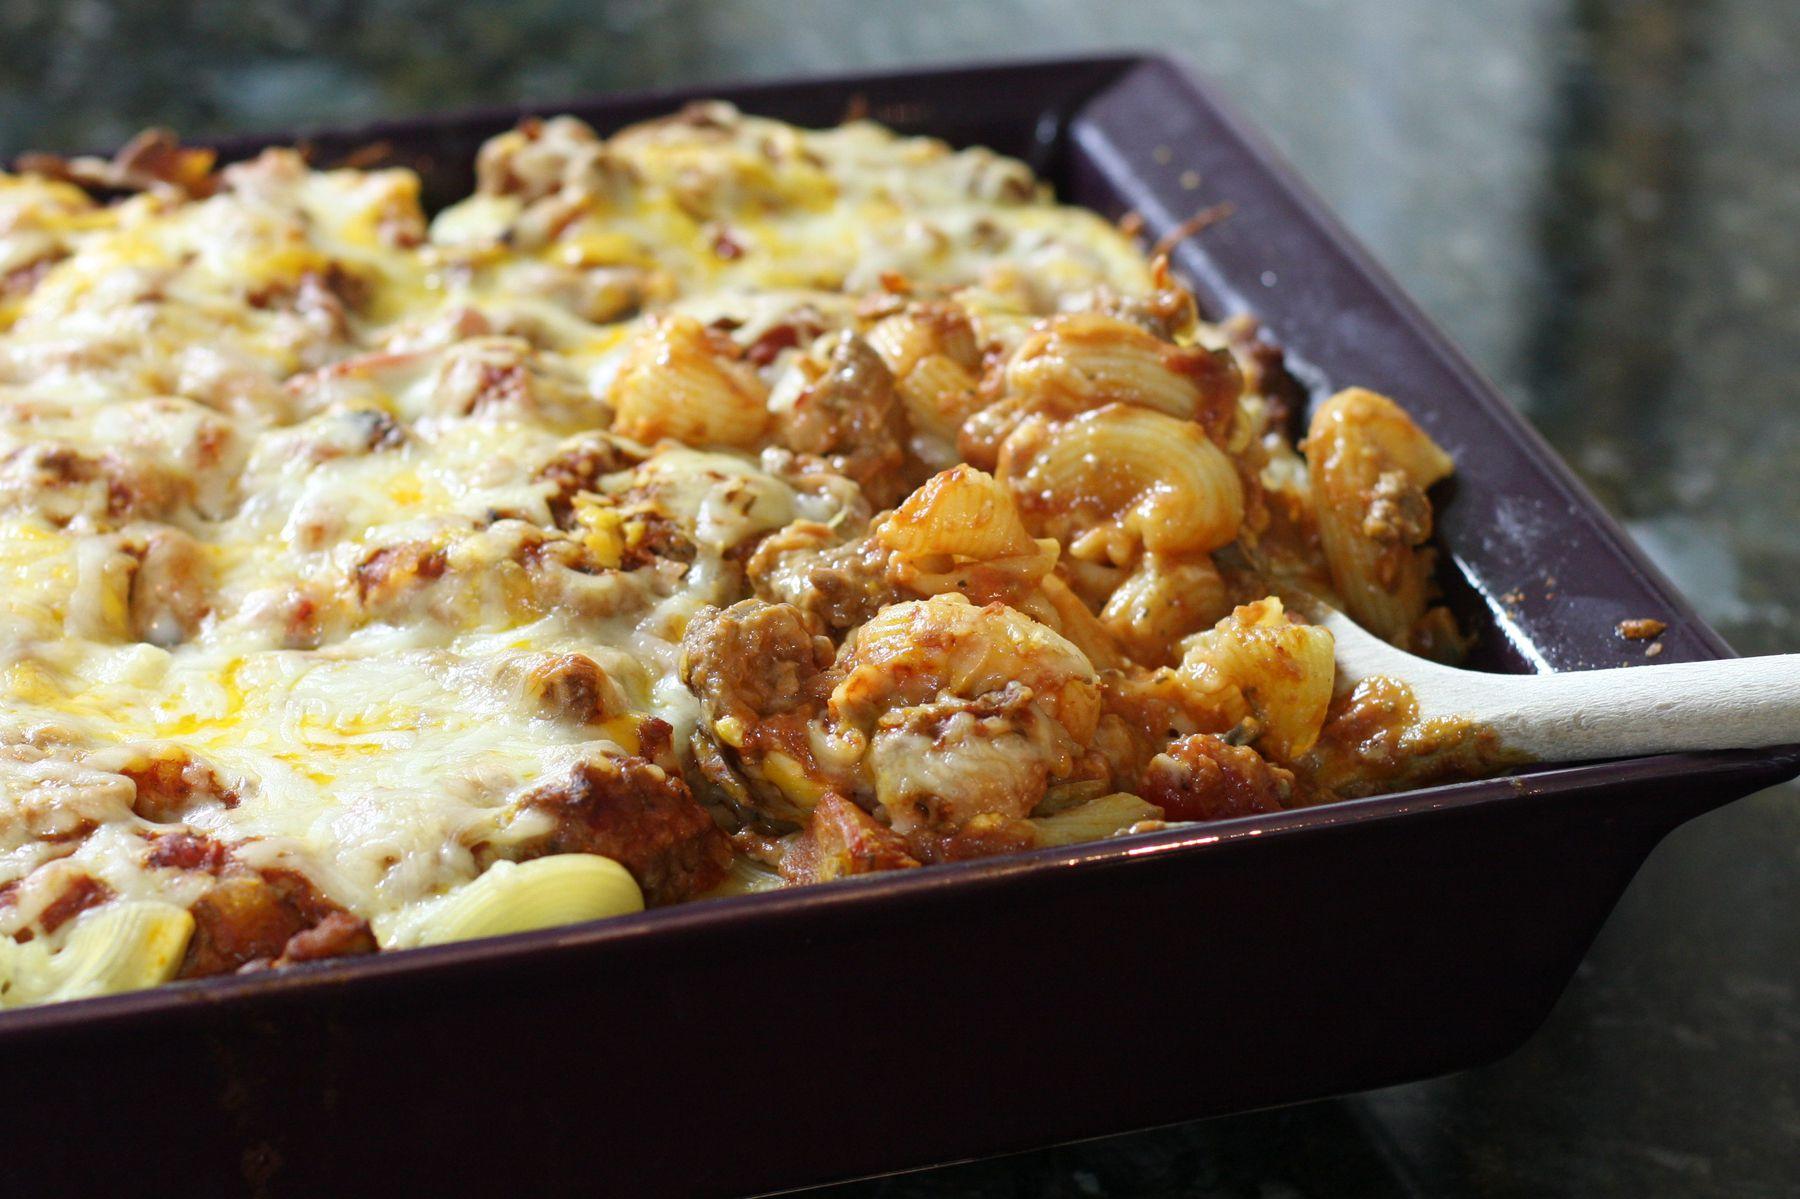 Ziti Casserole with Ground Beef and Mushrooms Recipe